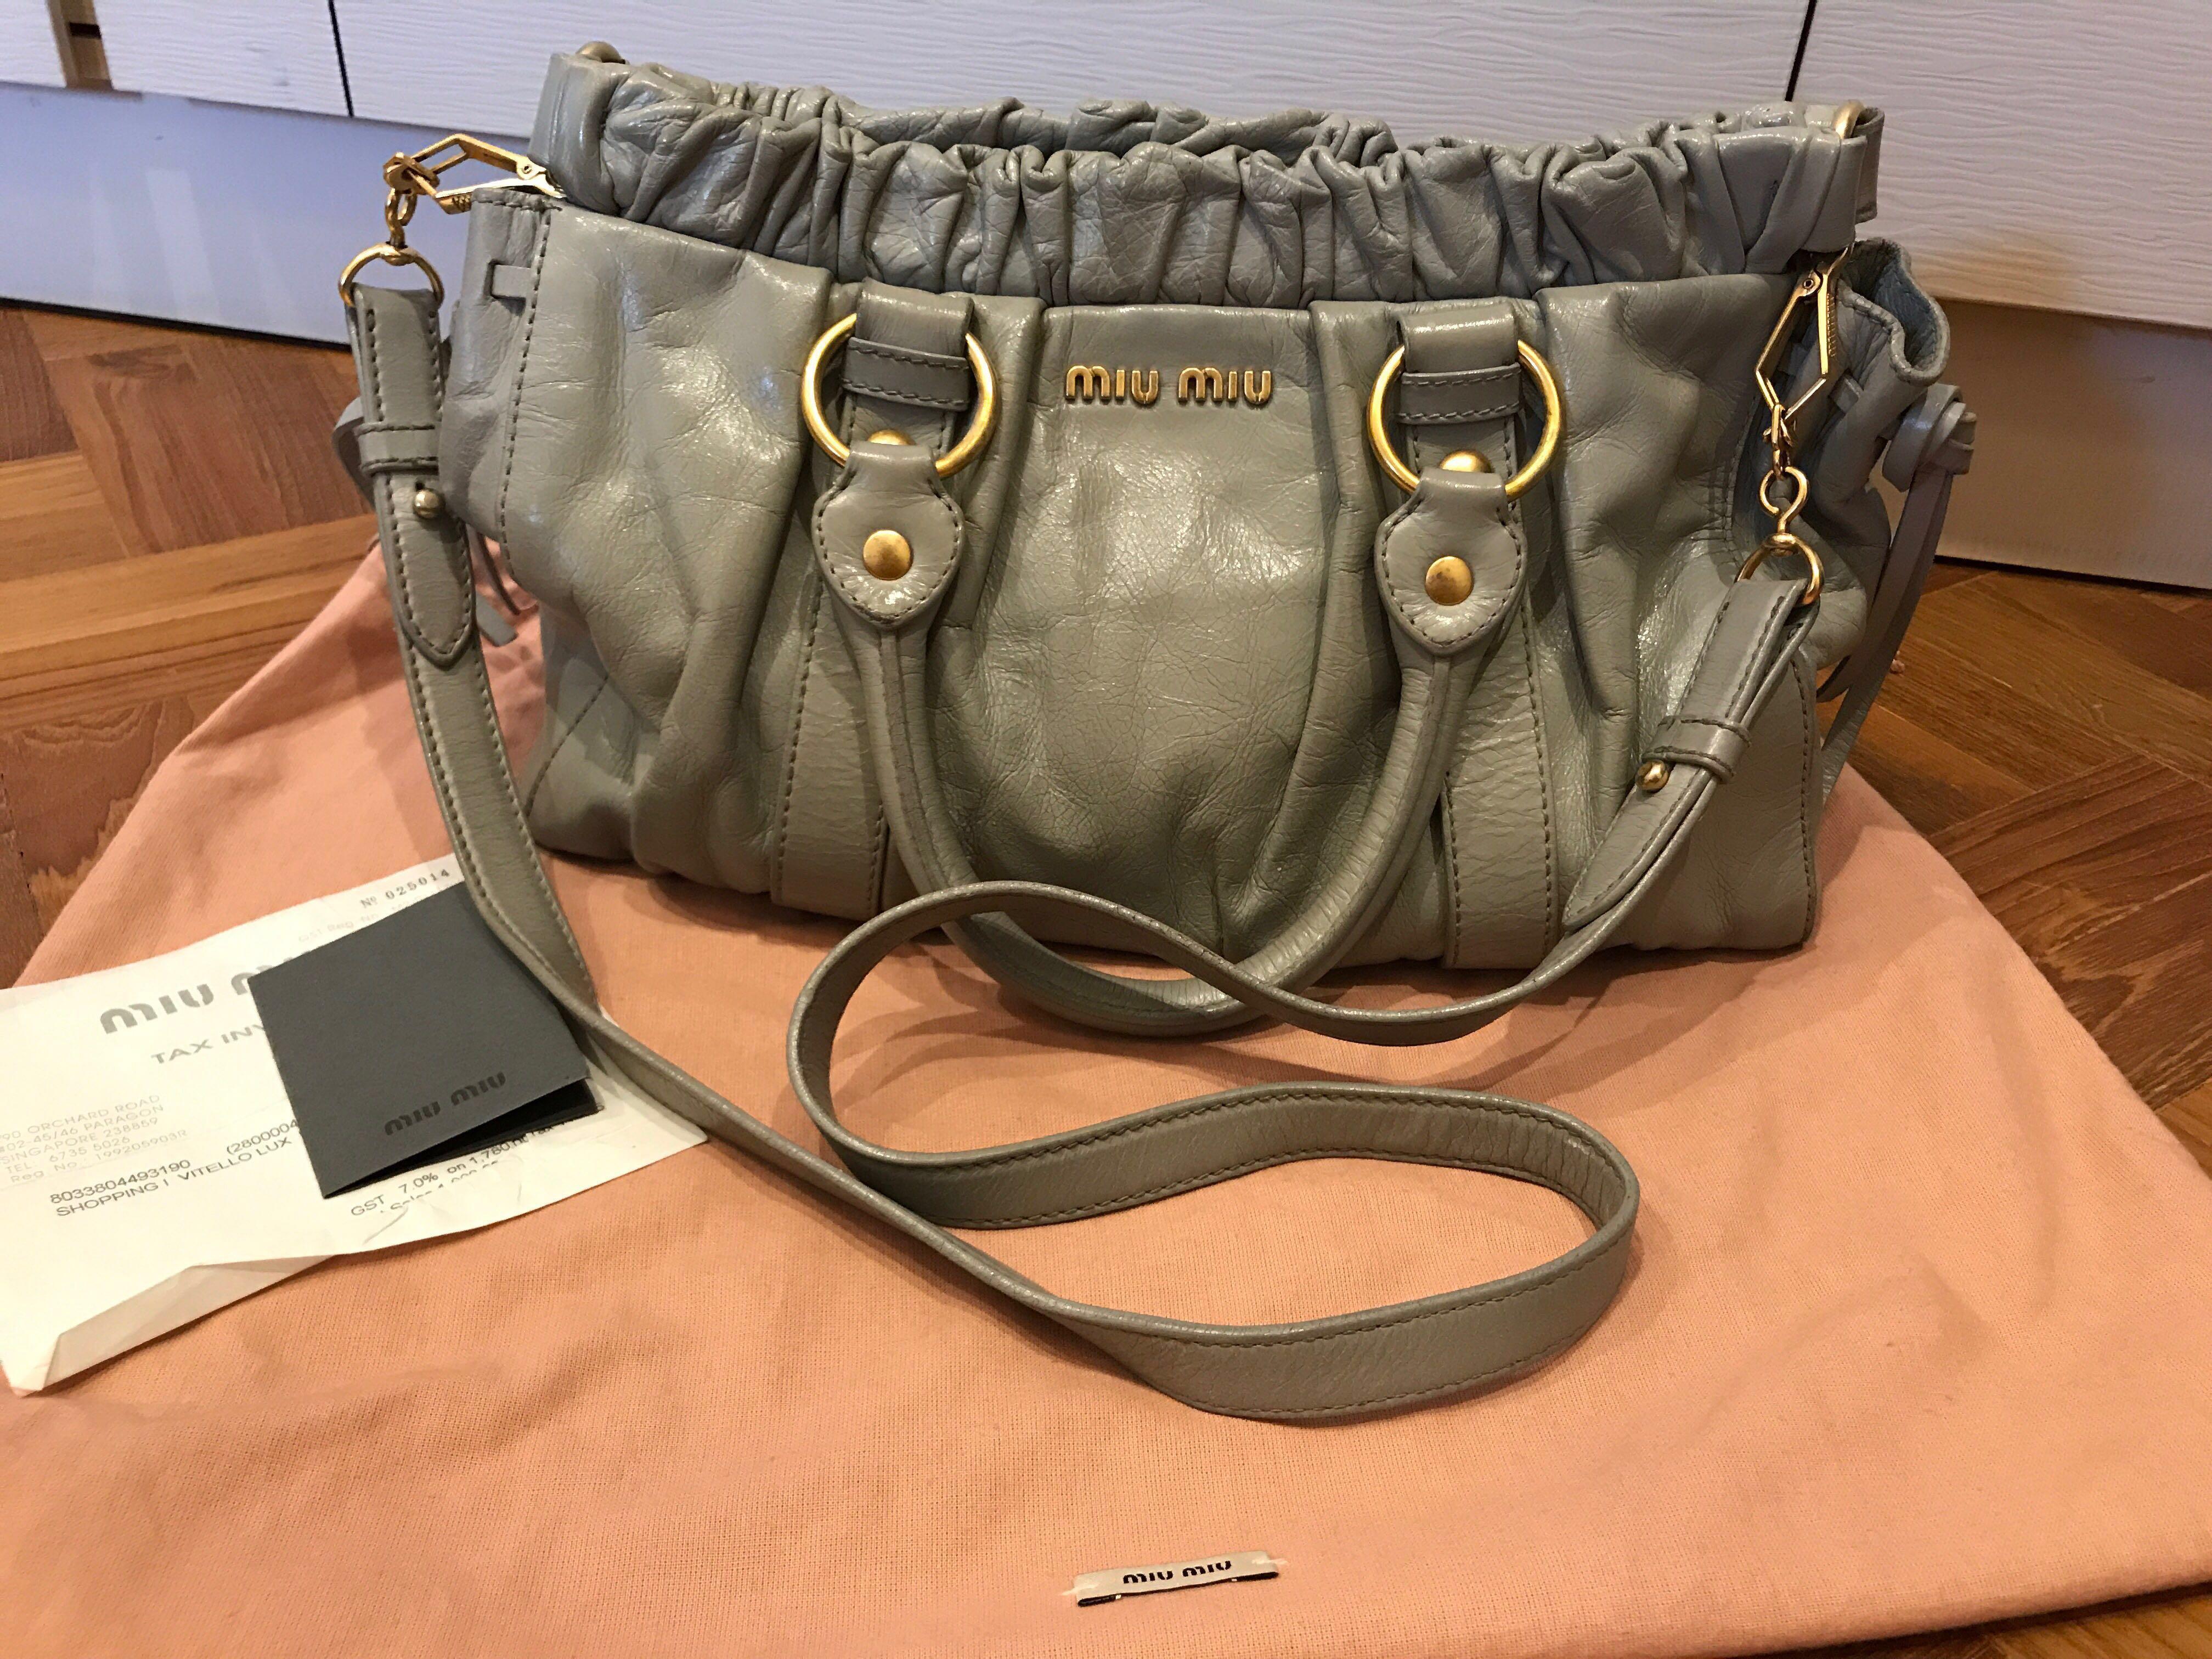 9b019fbb921b 100% Authentic Miu Miu Lux Vitello Bauletto Aperto Hand Bag Sling ...